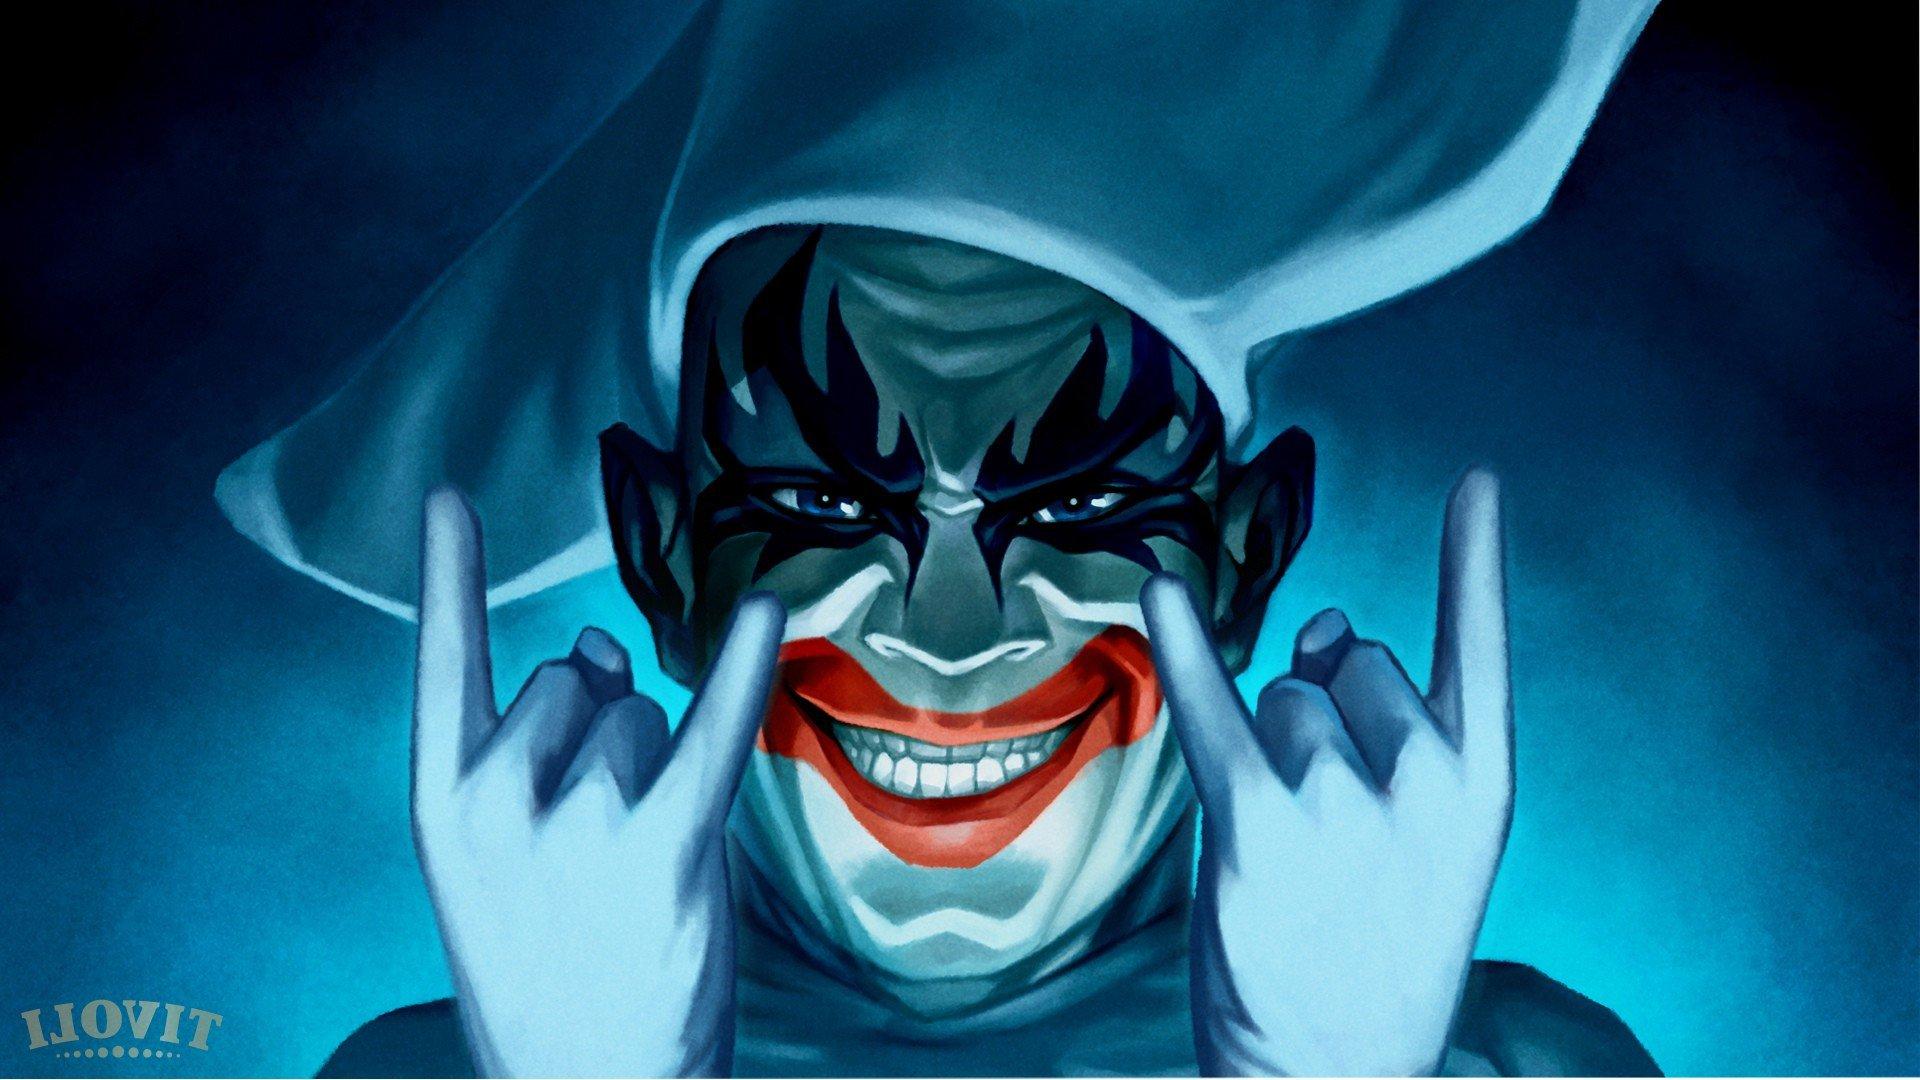 1920x1080 2016 Joker Art Laptop Full HD 1080P 4k Wallpapers